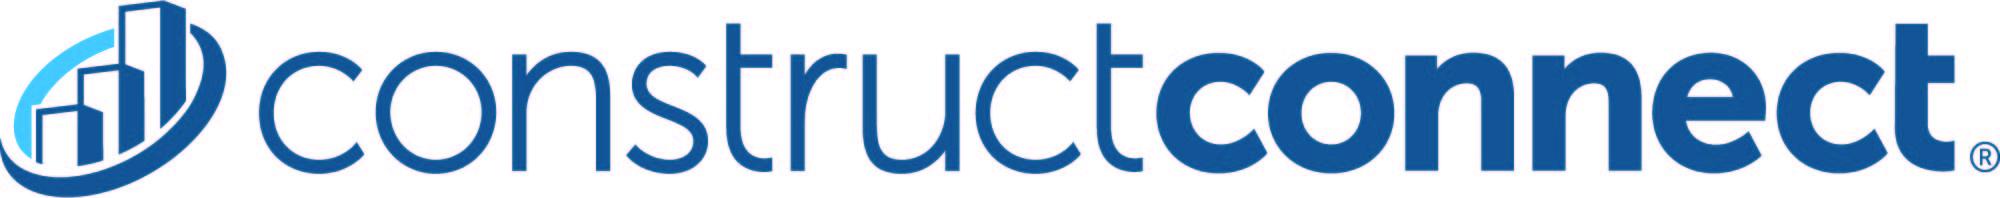 ConstructConnect Logo